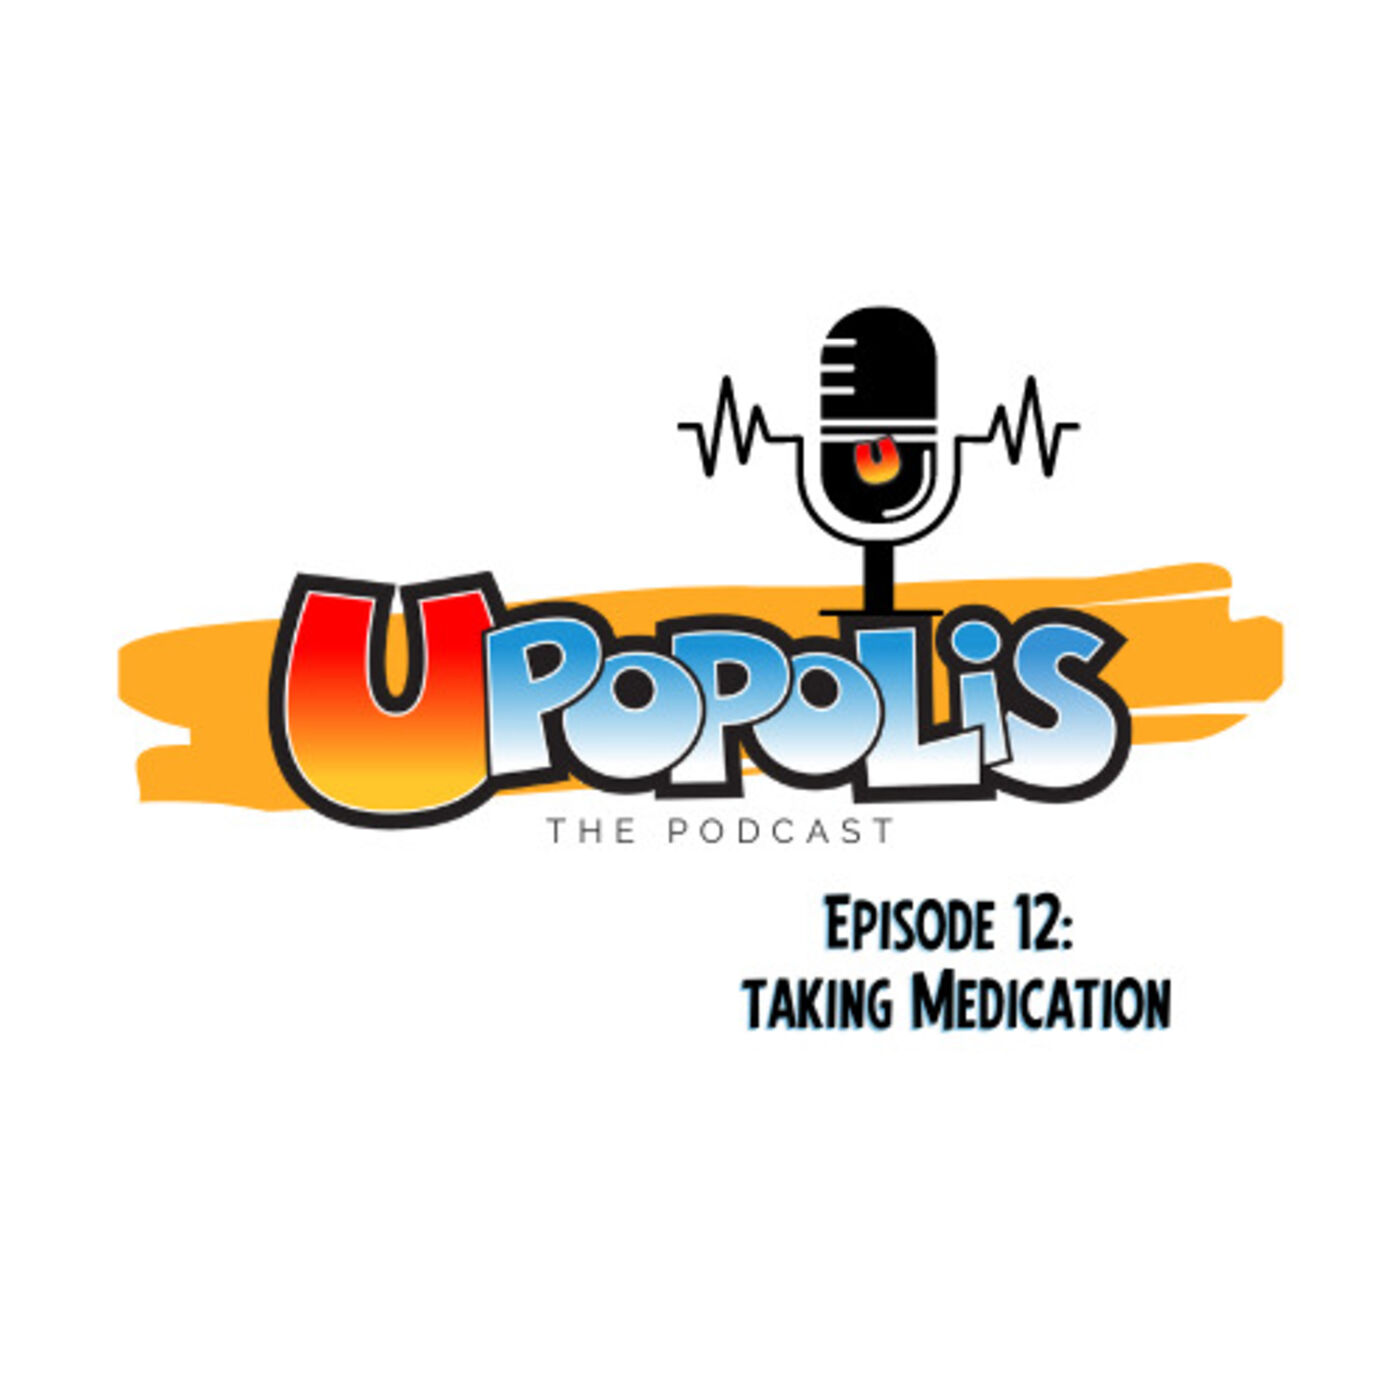 Episode 12: Taking Medication